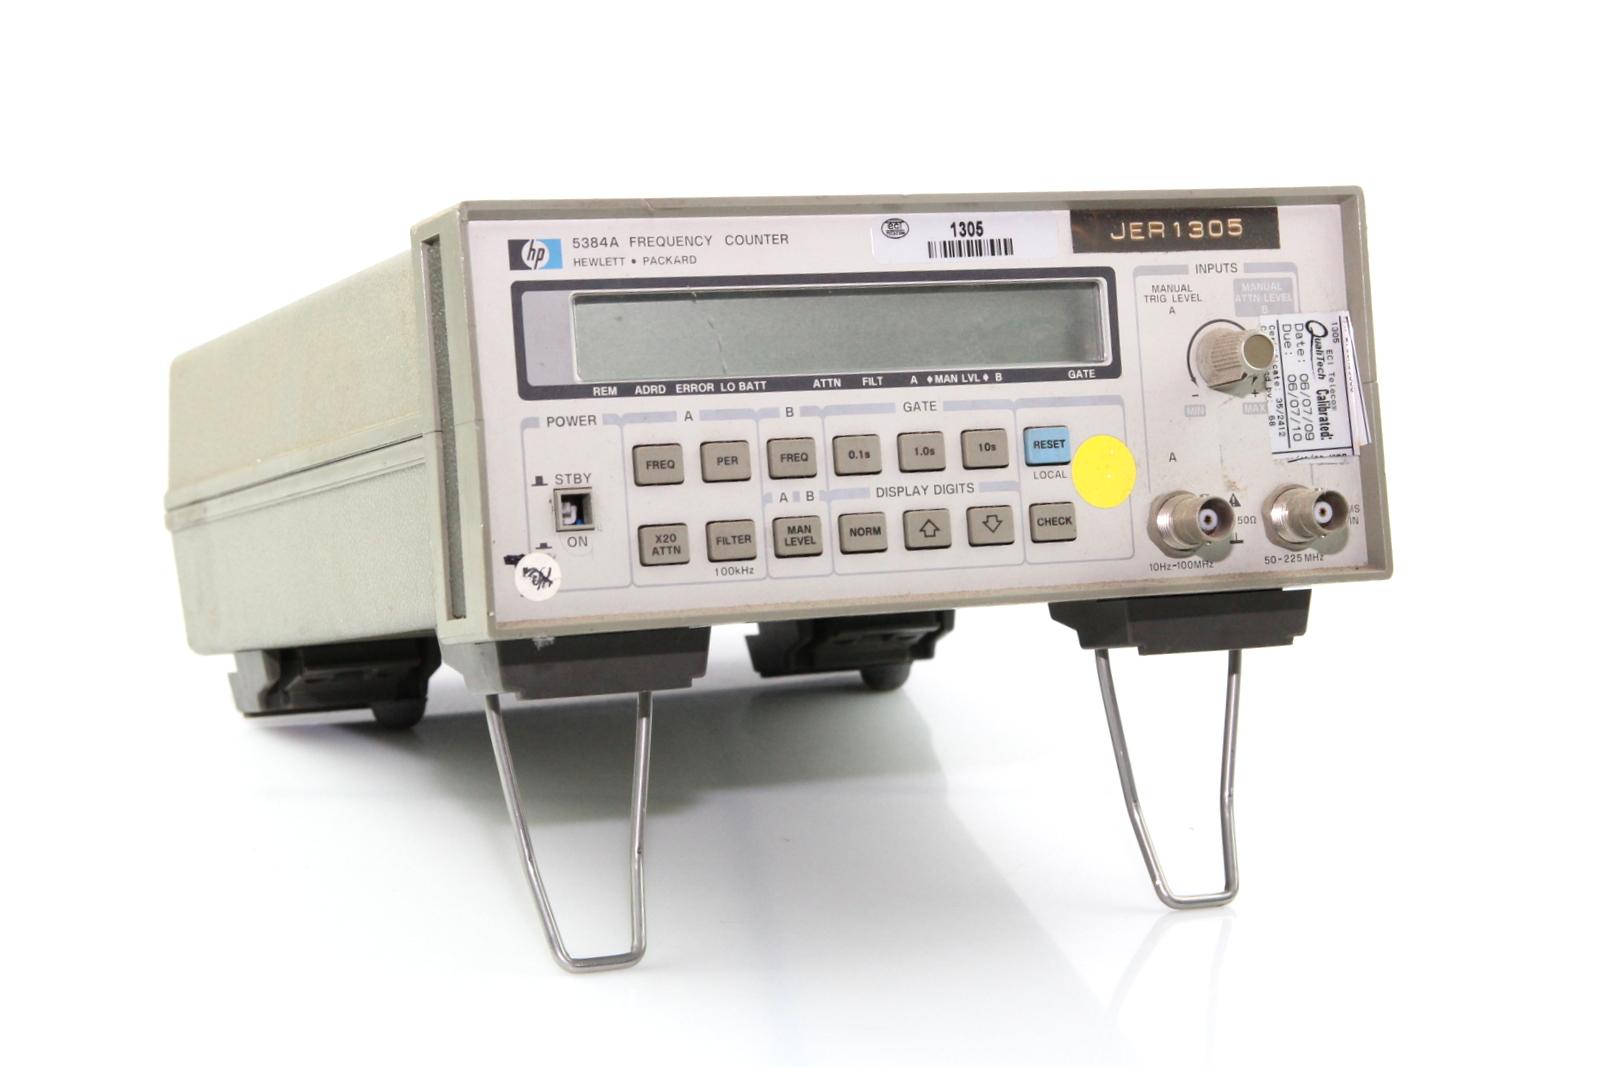 Hp Frequency Counter : Hewlett packard hp a frequency counter ebay